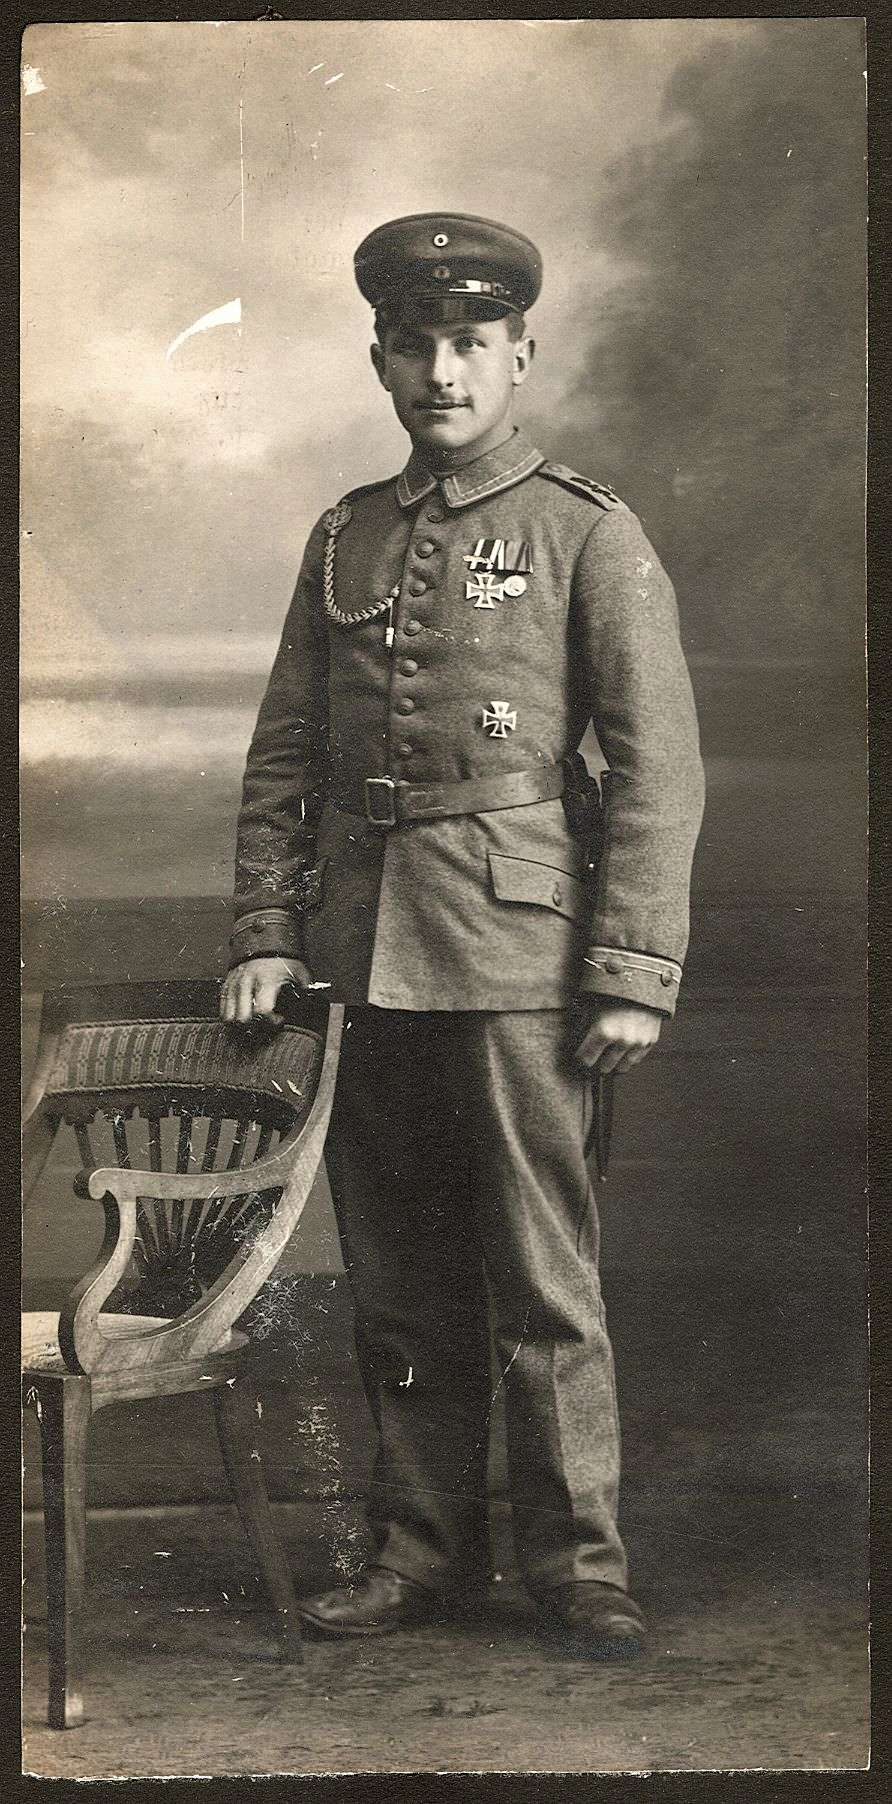 Beusch, Gustav, Bild 1